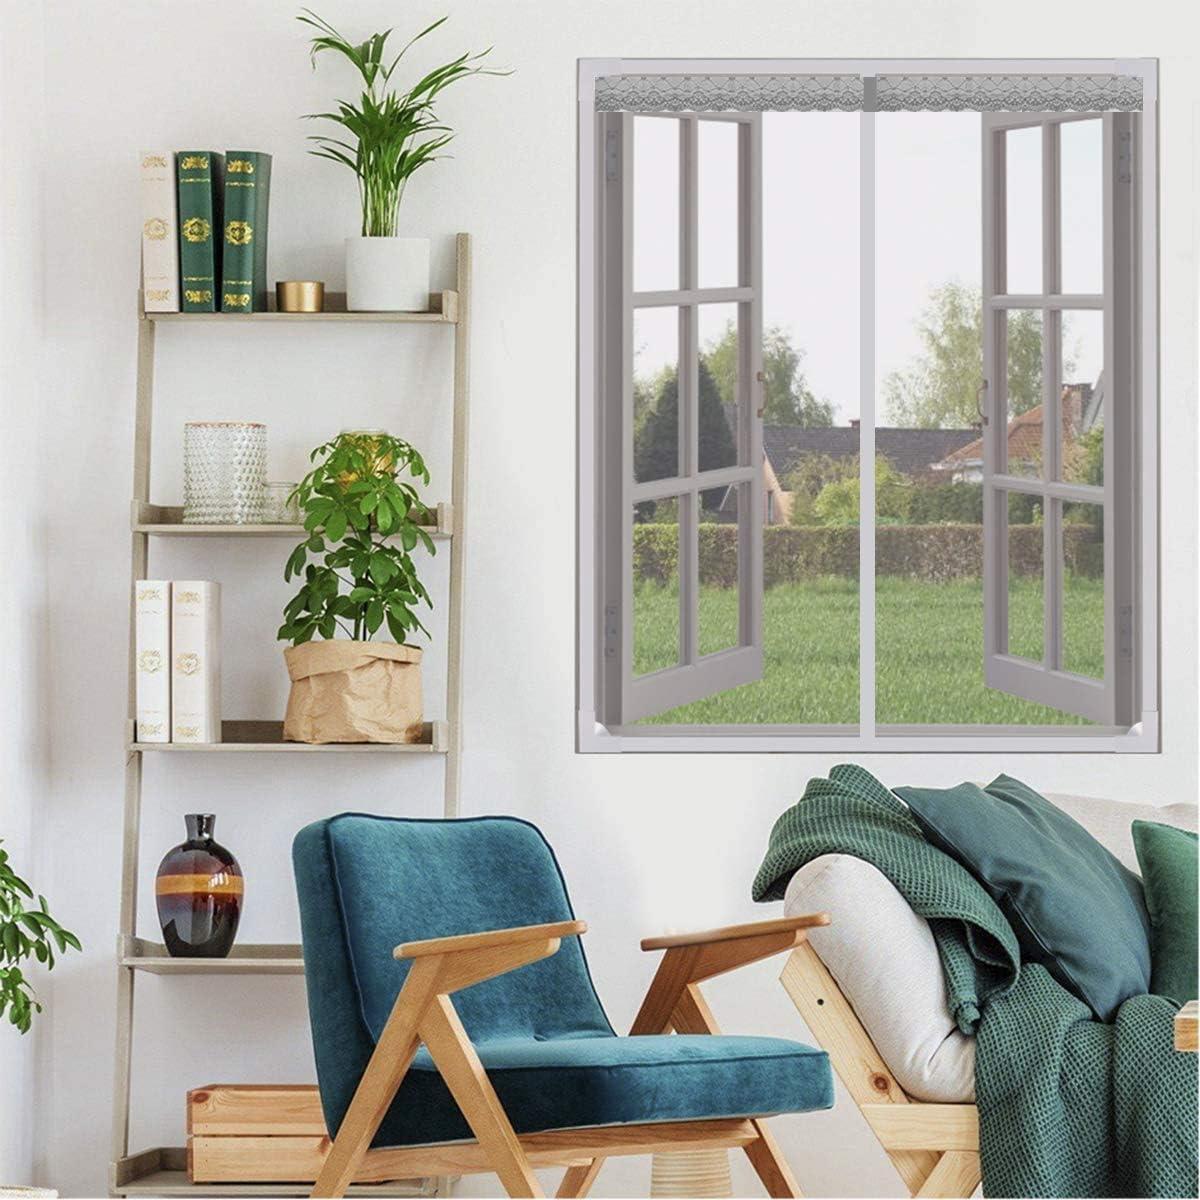 con cinta autoadhesiva de marco completo mosquitos Mosquitera magn/ética para ventana para detener insectos